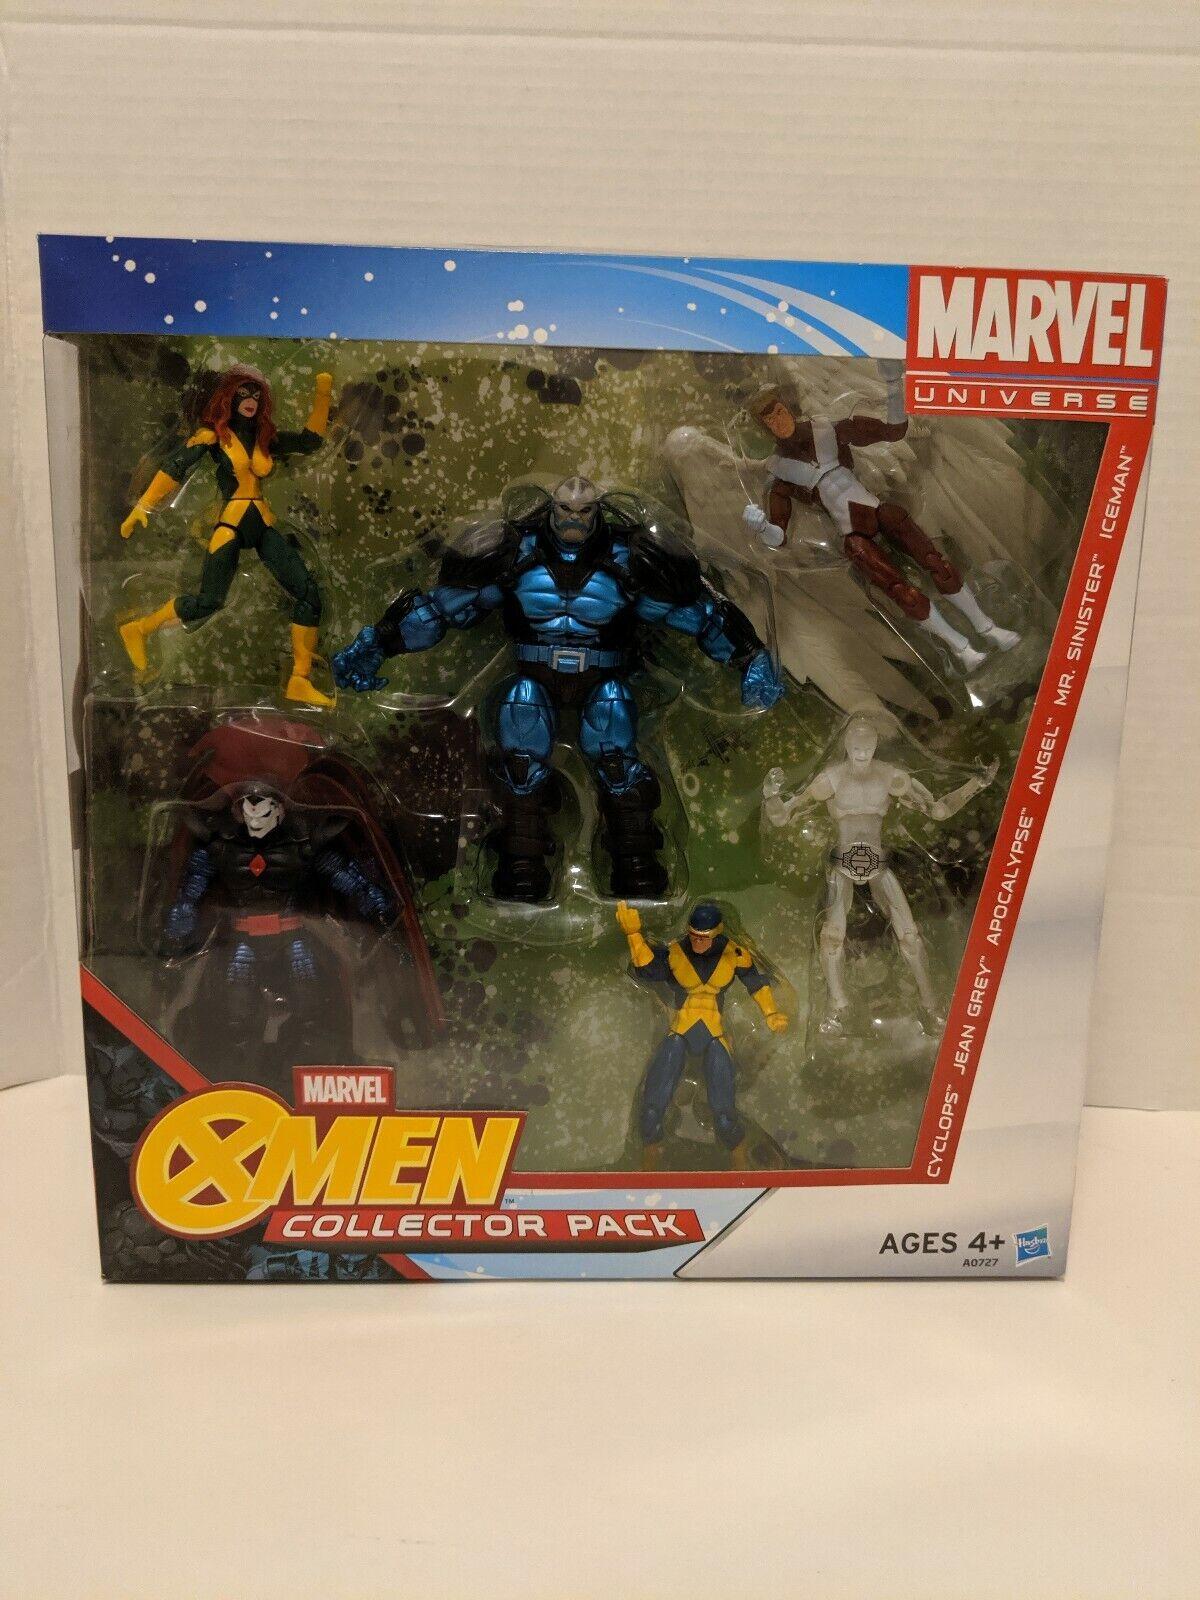 "Marvel Universe X-Men 6 Figure Collector Pack Box Set 3.75""  Hasbro 2012 TRU"